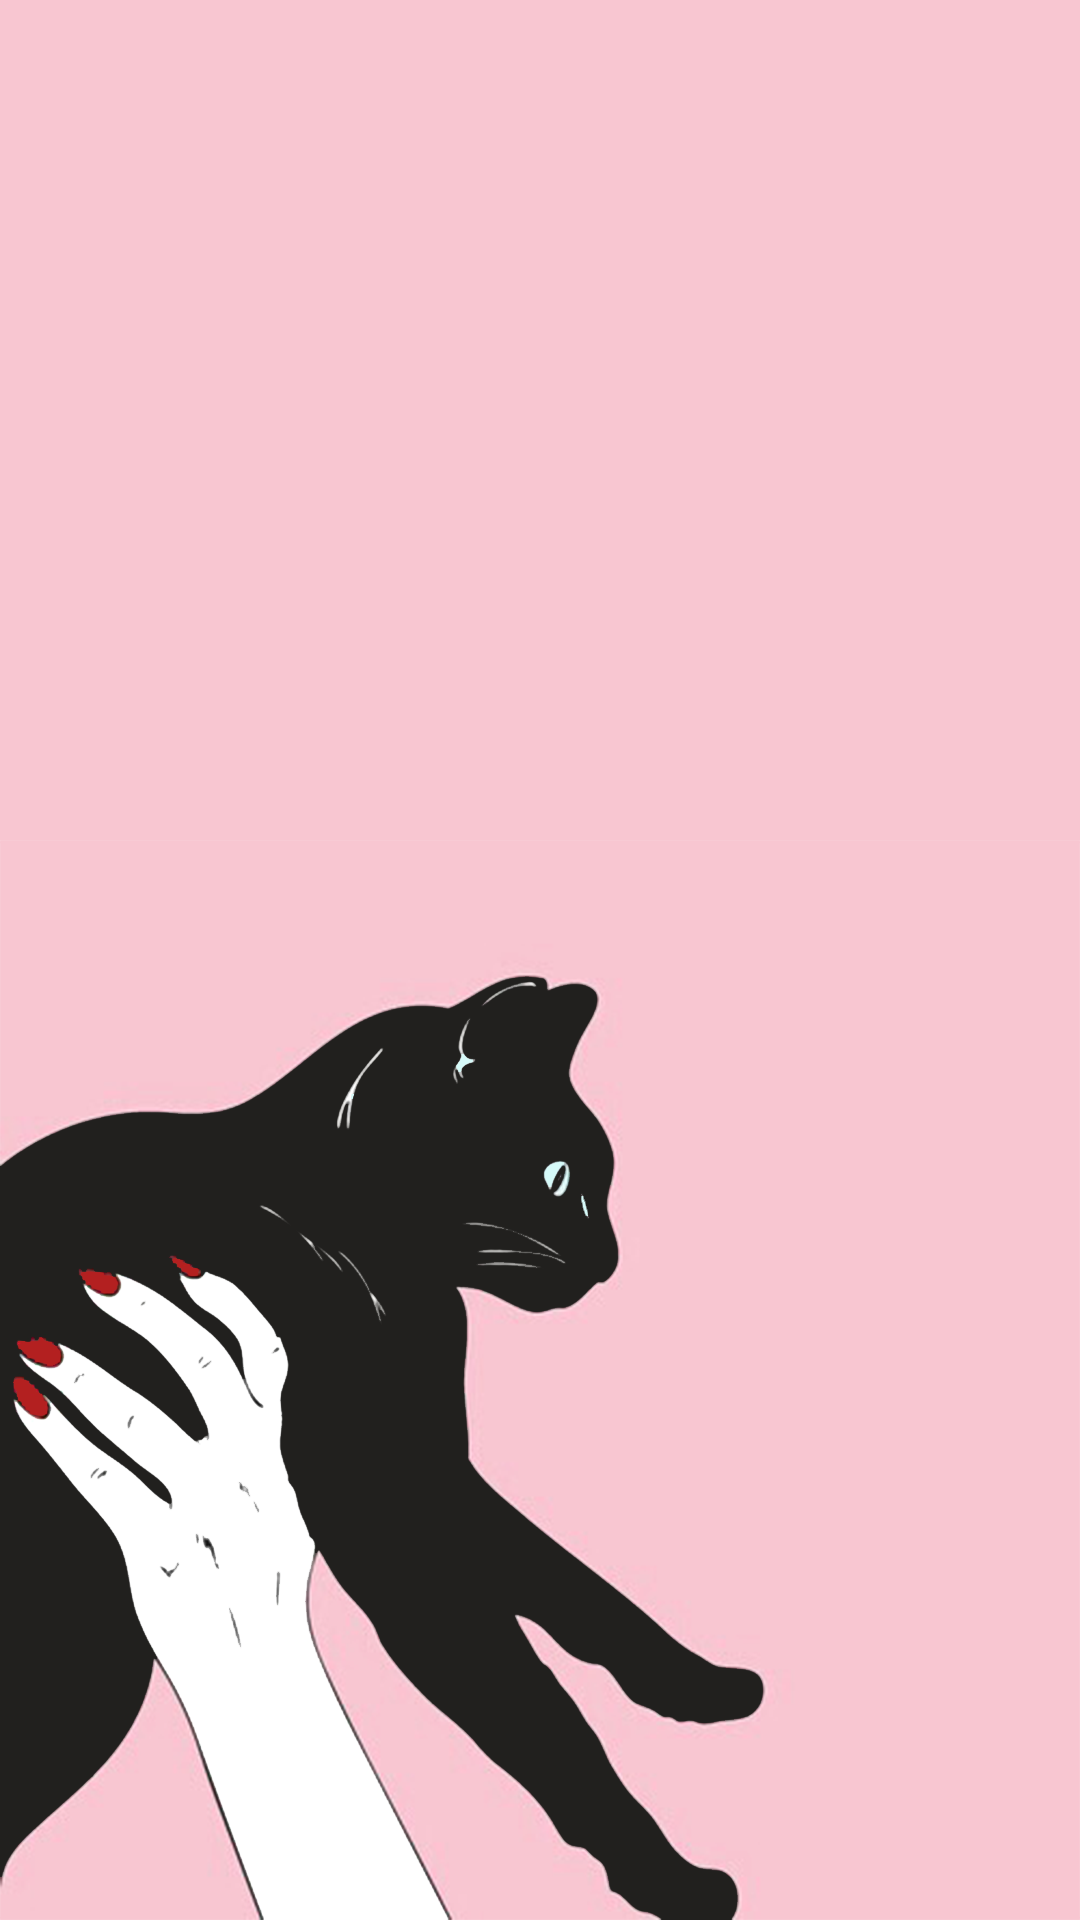 Kitten iphone wallpaper tumblr - Cat Lockscreens Tumblr